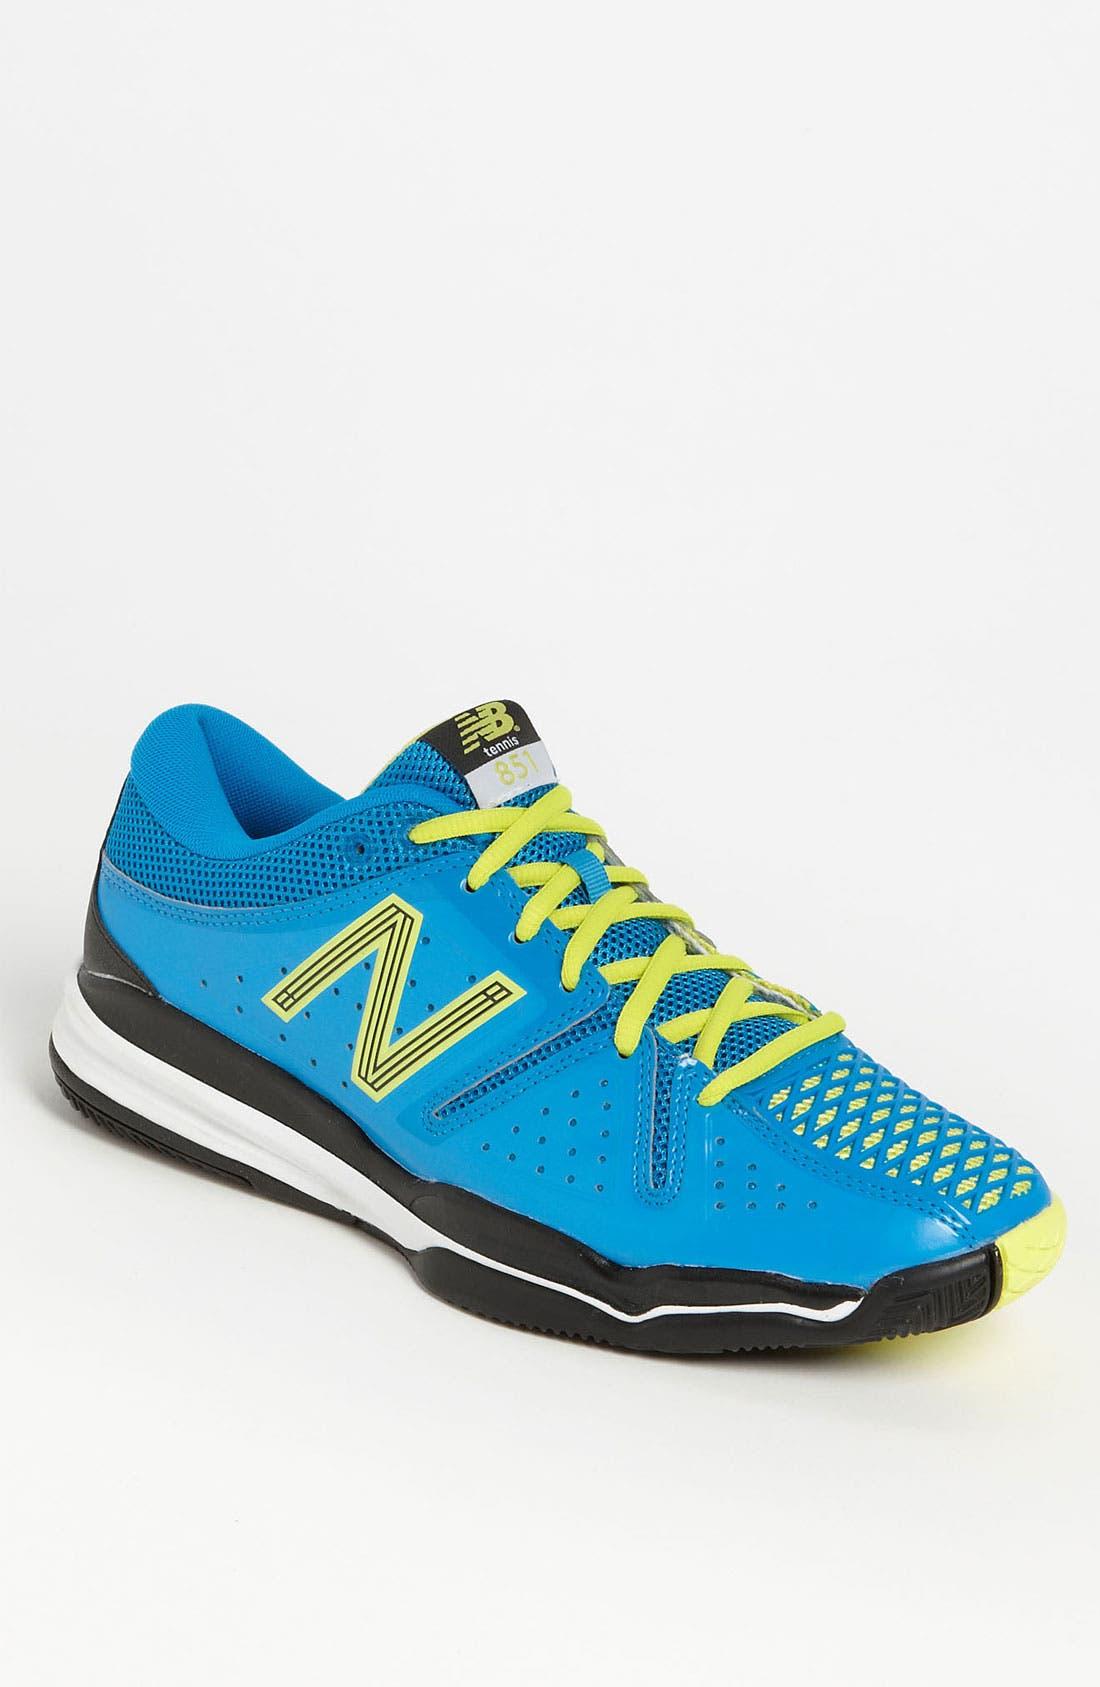 Main Image - New Balance '851' Tennis Shoe (Men)